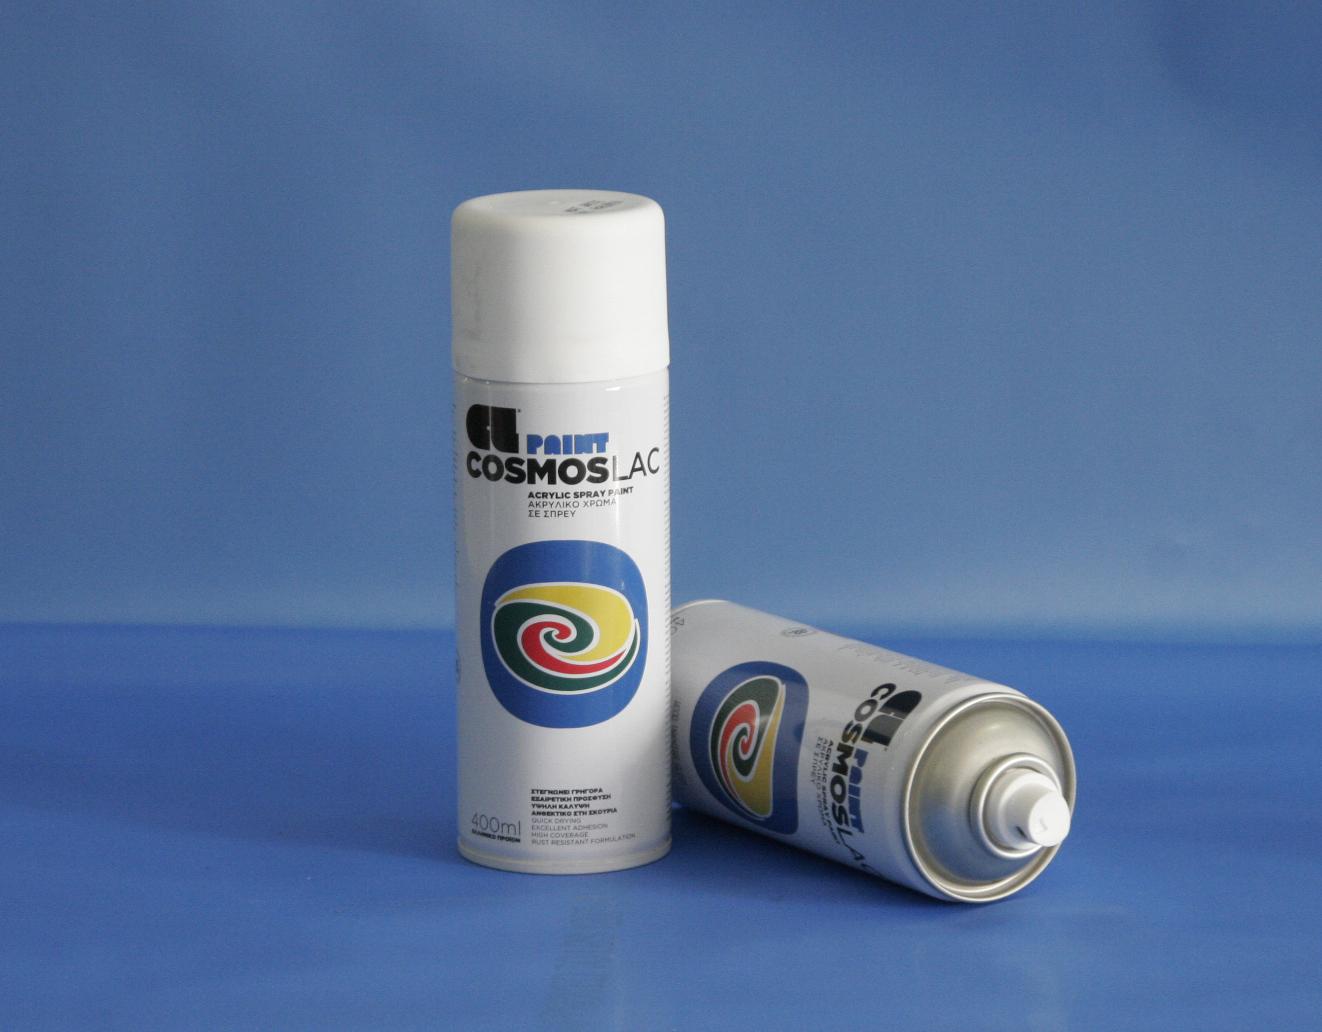 Cosmos-Lac N301 400ml Flat Matte White (Spray Can)